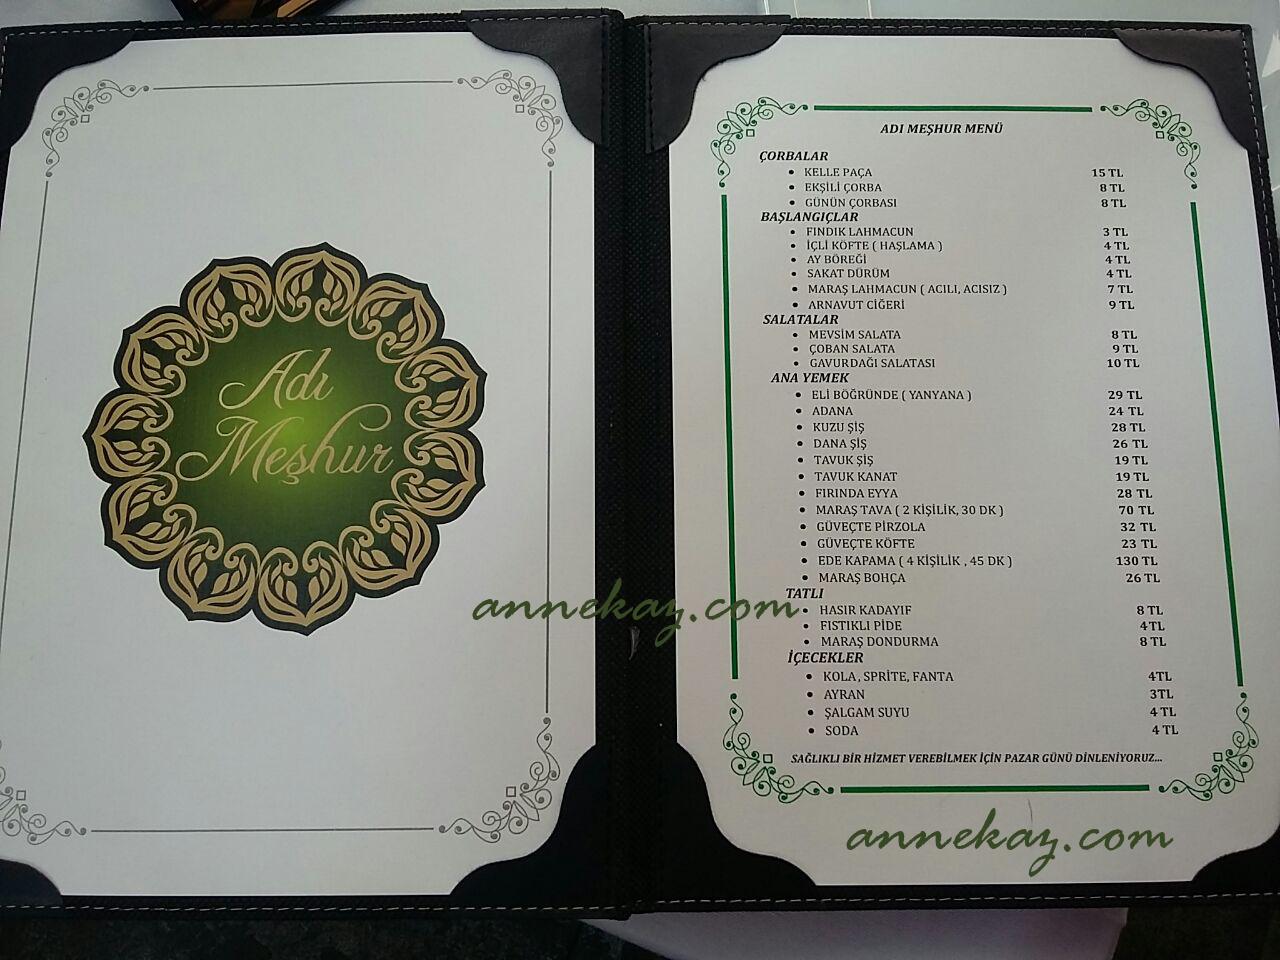 adi meshur menu1